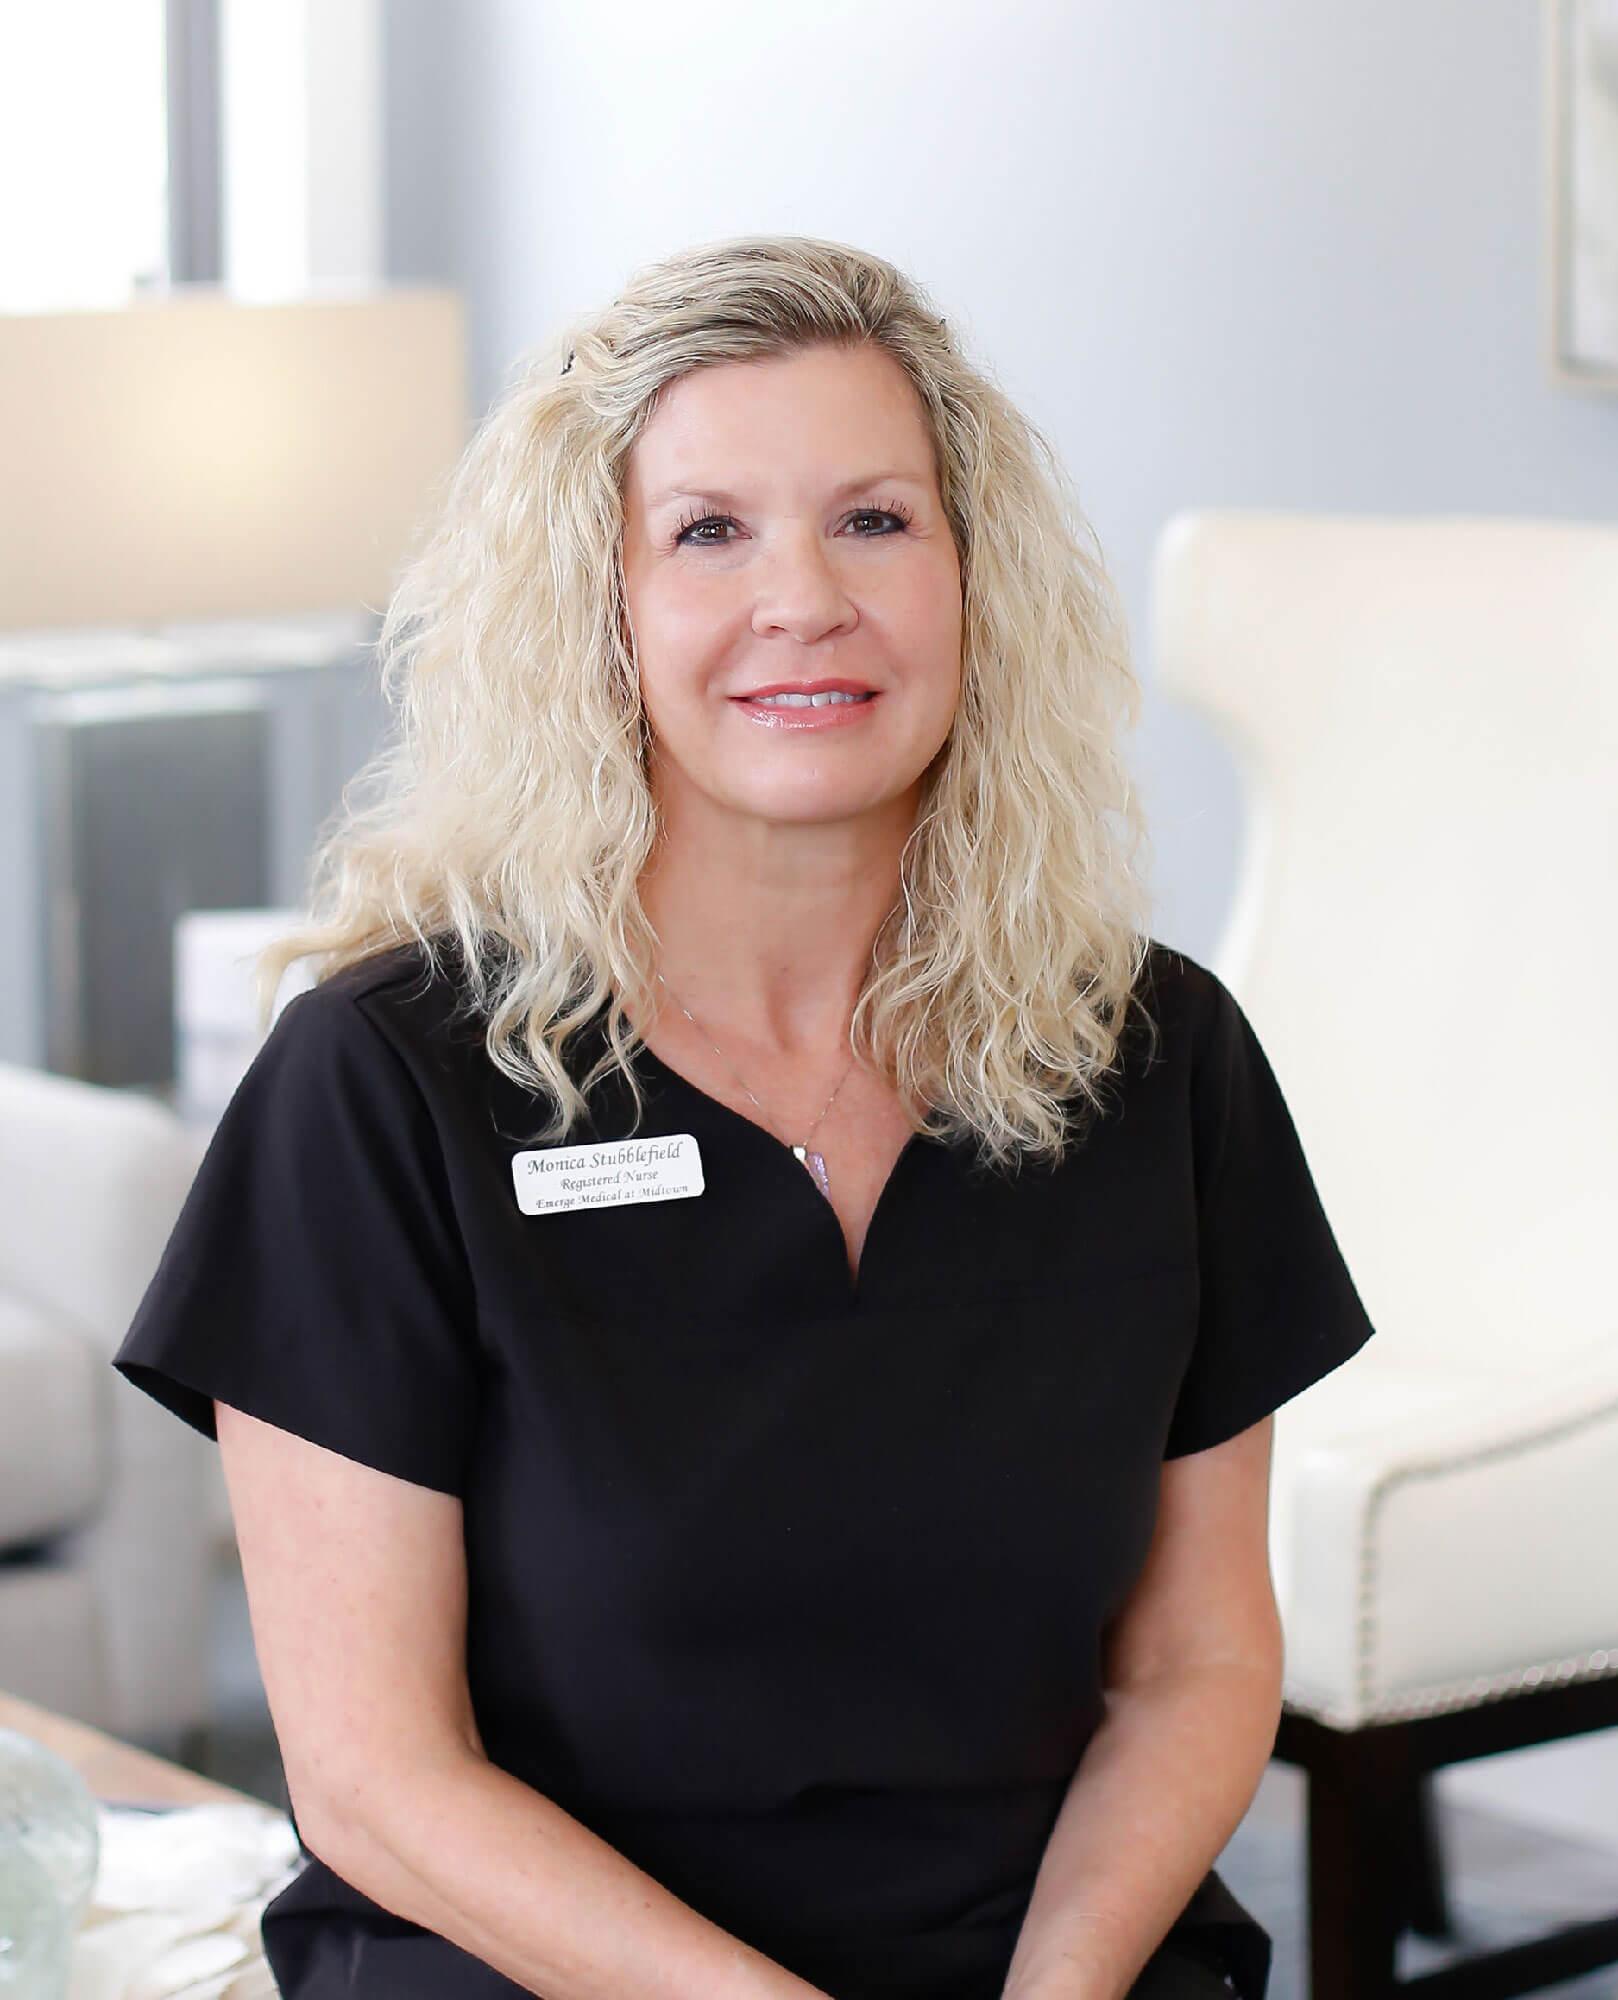 Monica Stubblefield Emerge staff photo